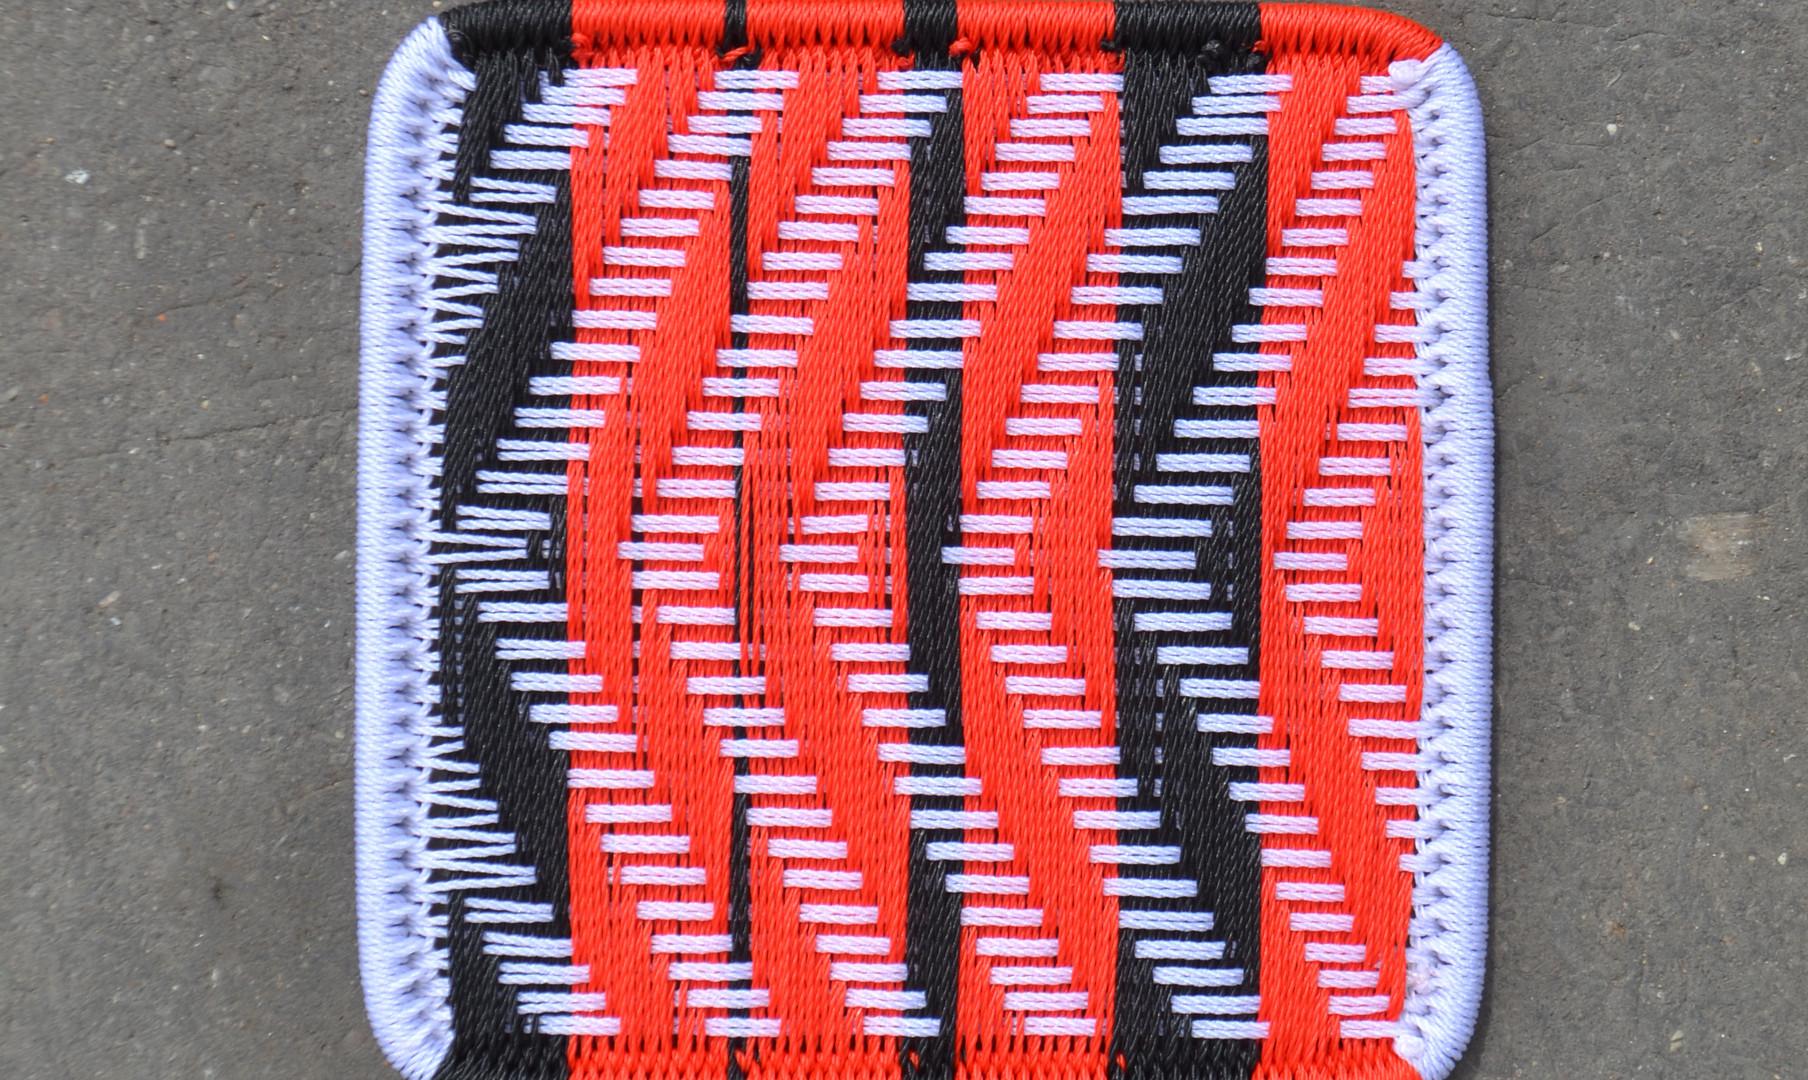 Blanc / rouge / bandes noires